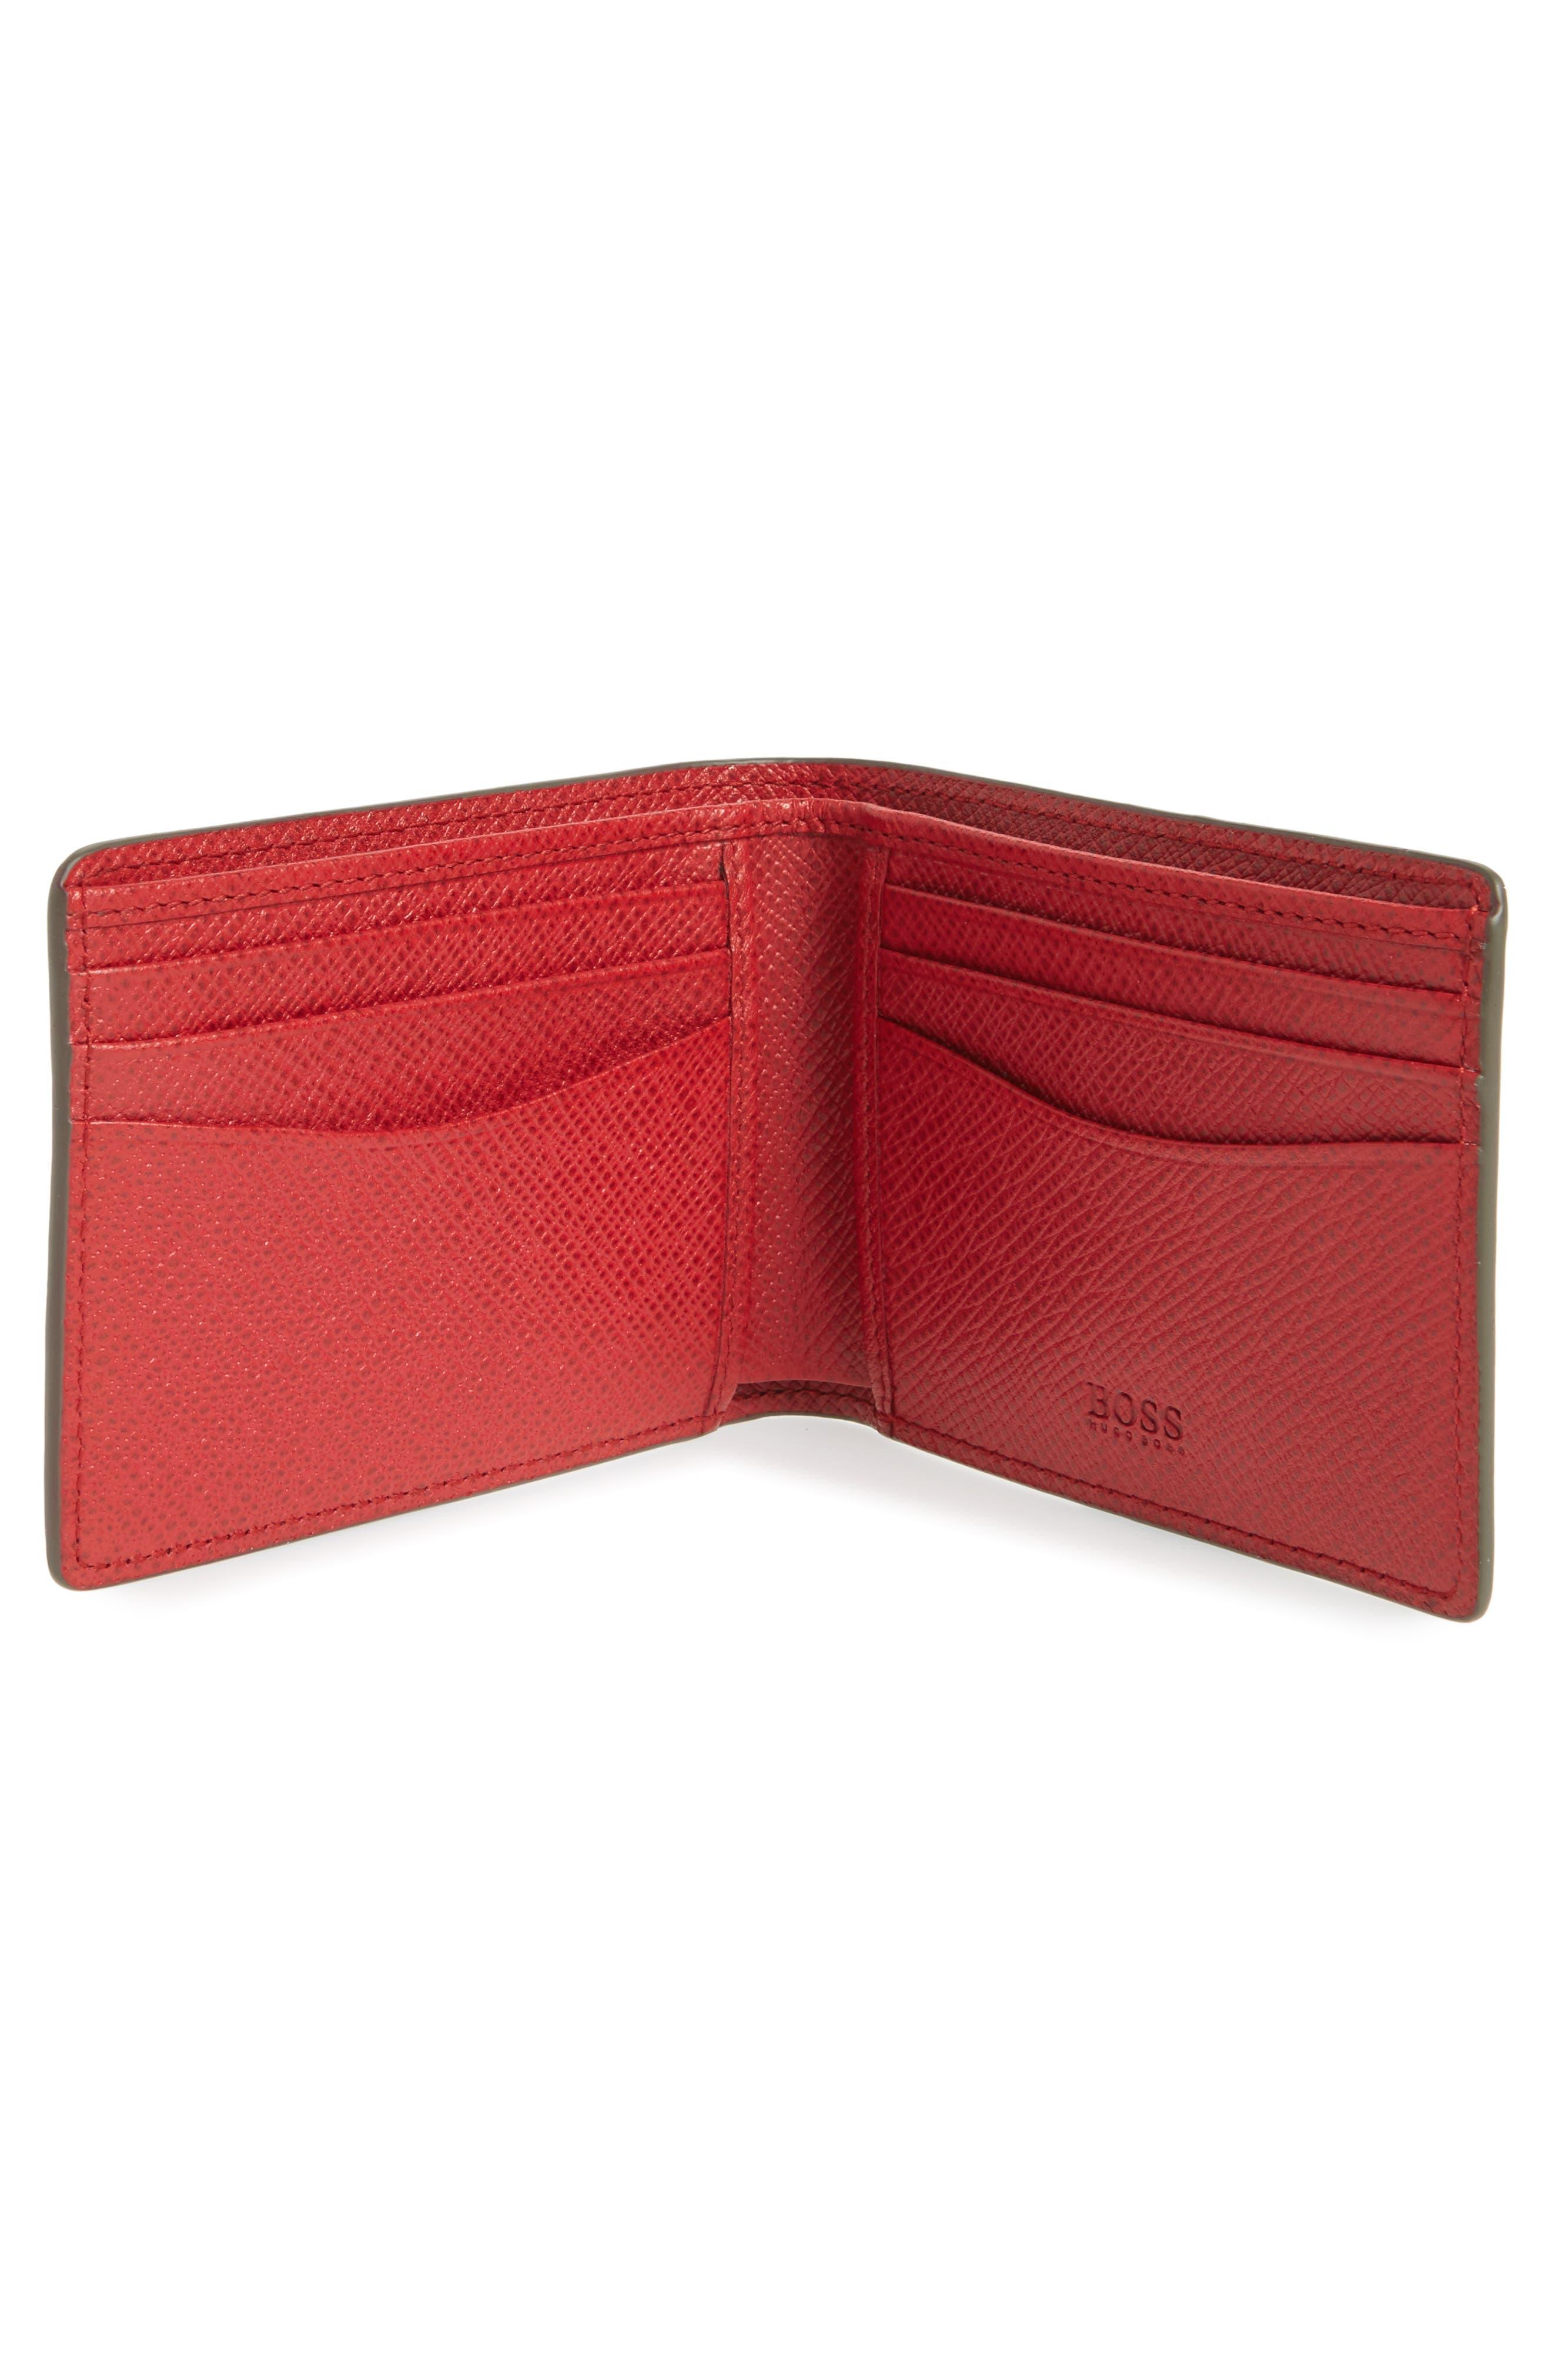 'Signature' Bifold Wallet,                             Alternate thumbnail 2, color,                             612